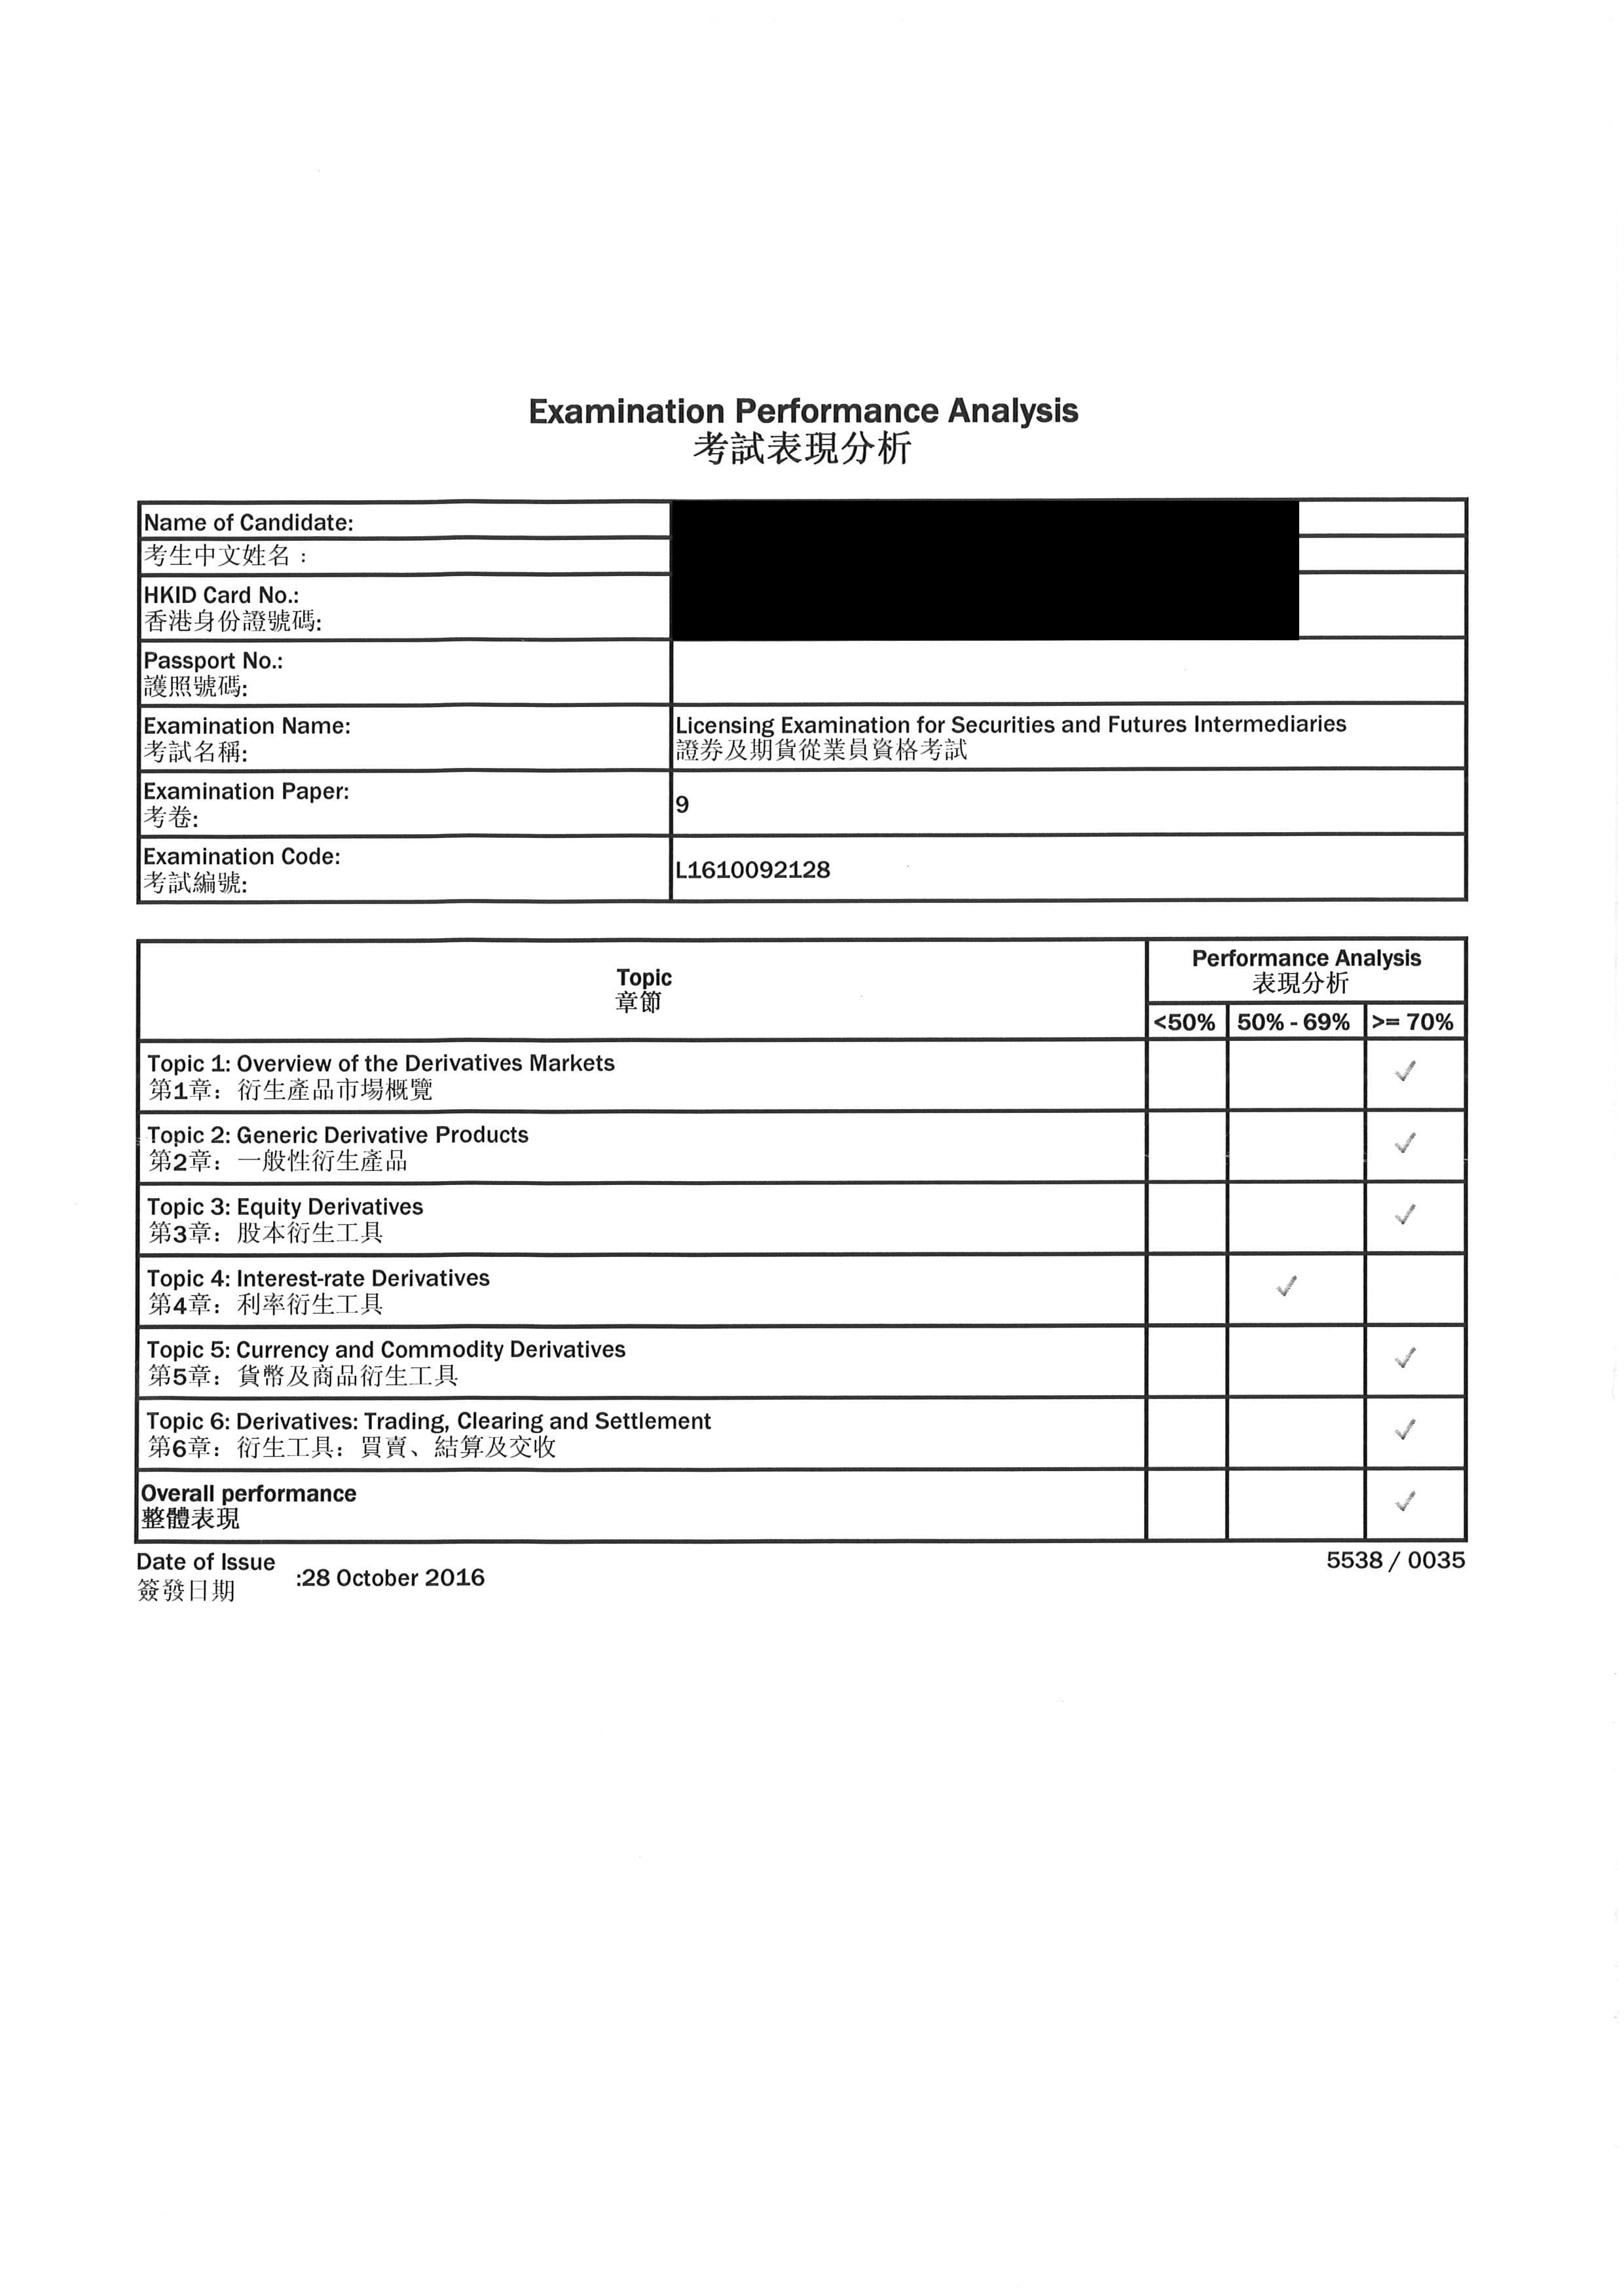 SJD 28/10/2016 LE Paper 9 證券期貨從業員資格考試卷九 Pass